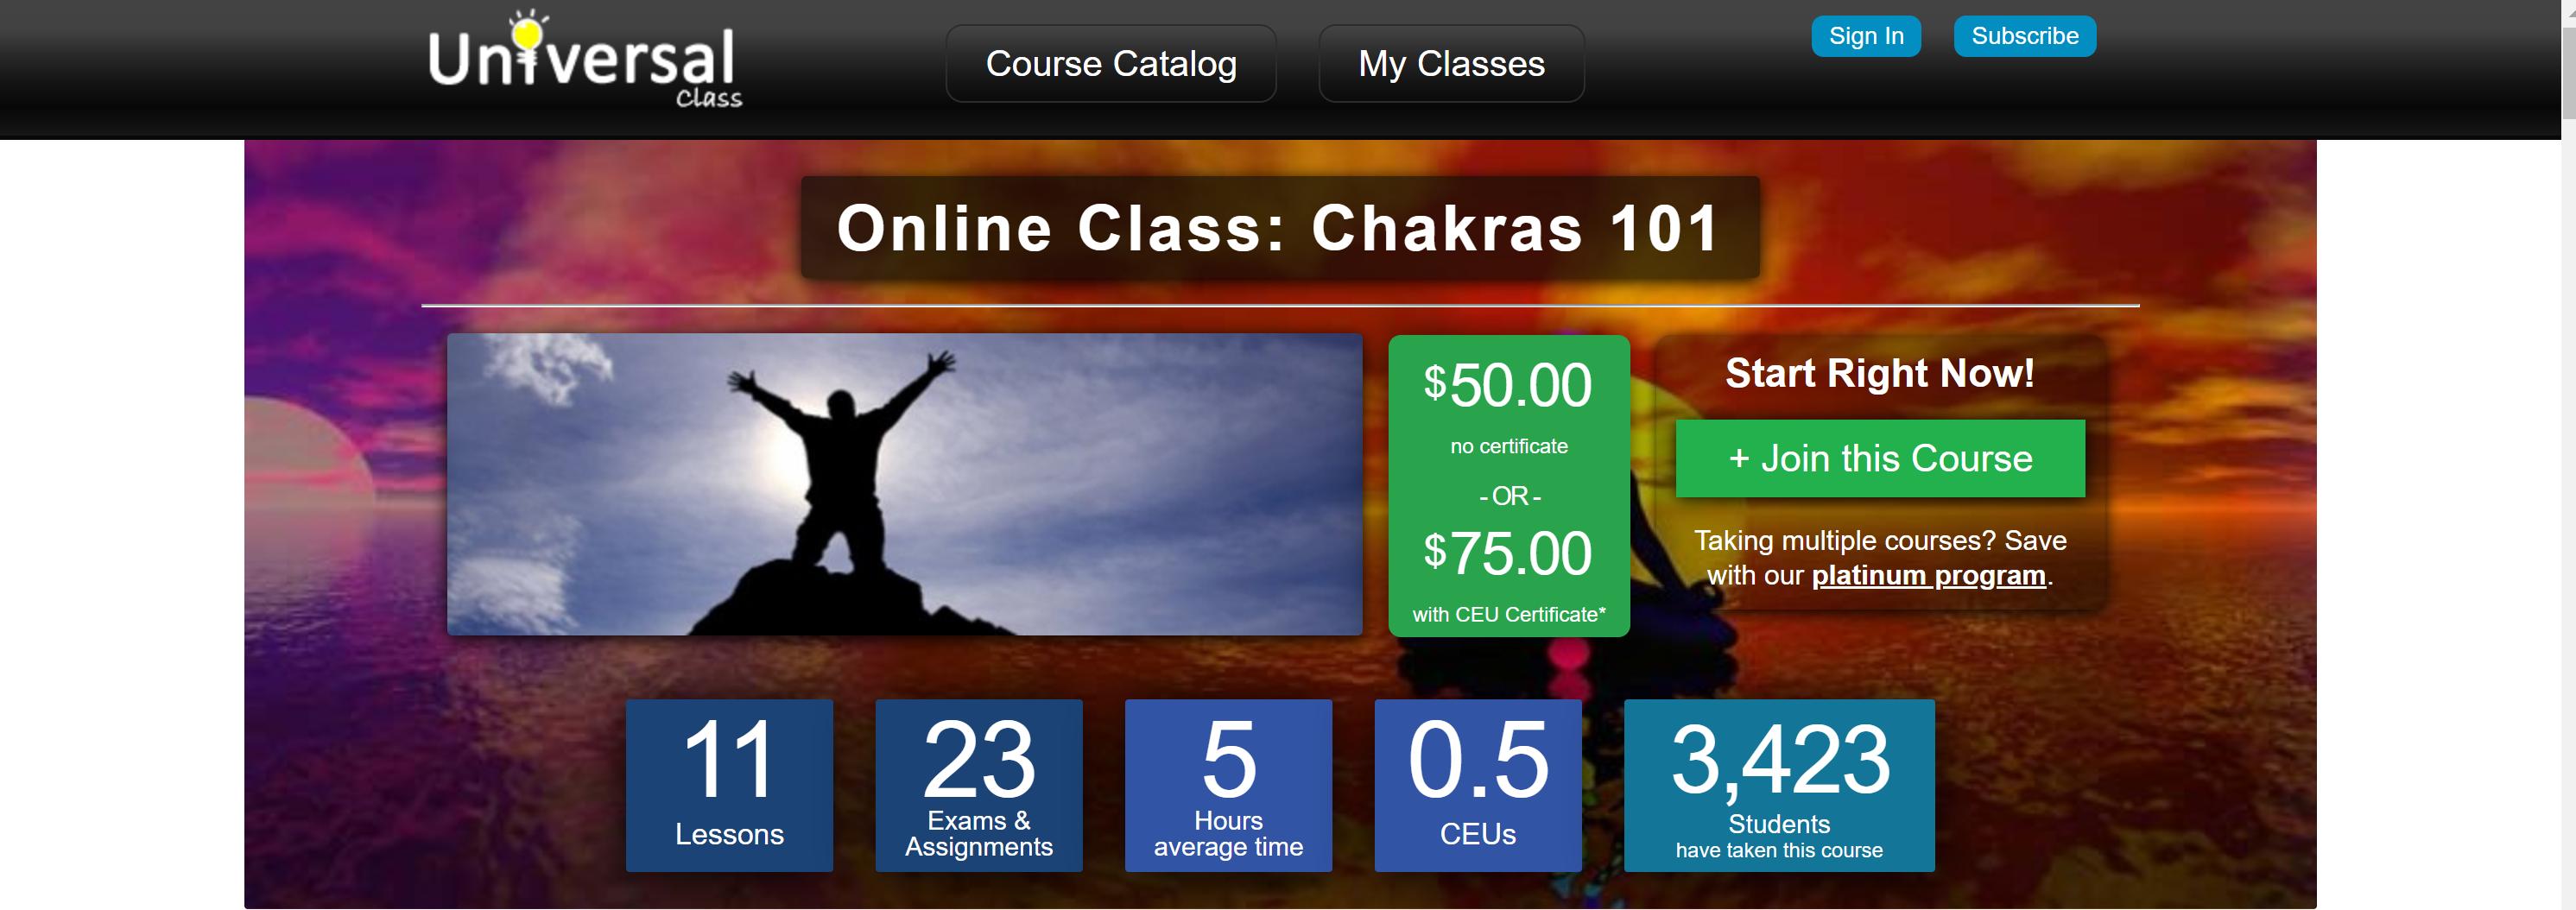 Universal Classs for Chakra